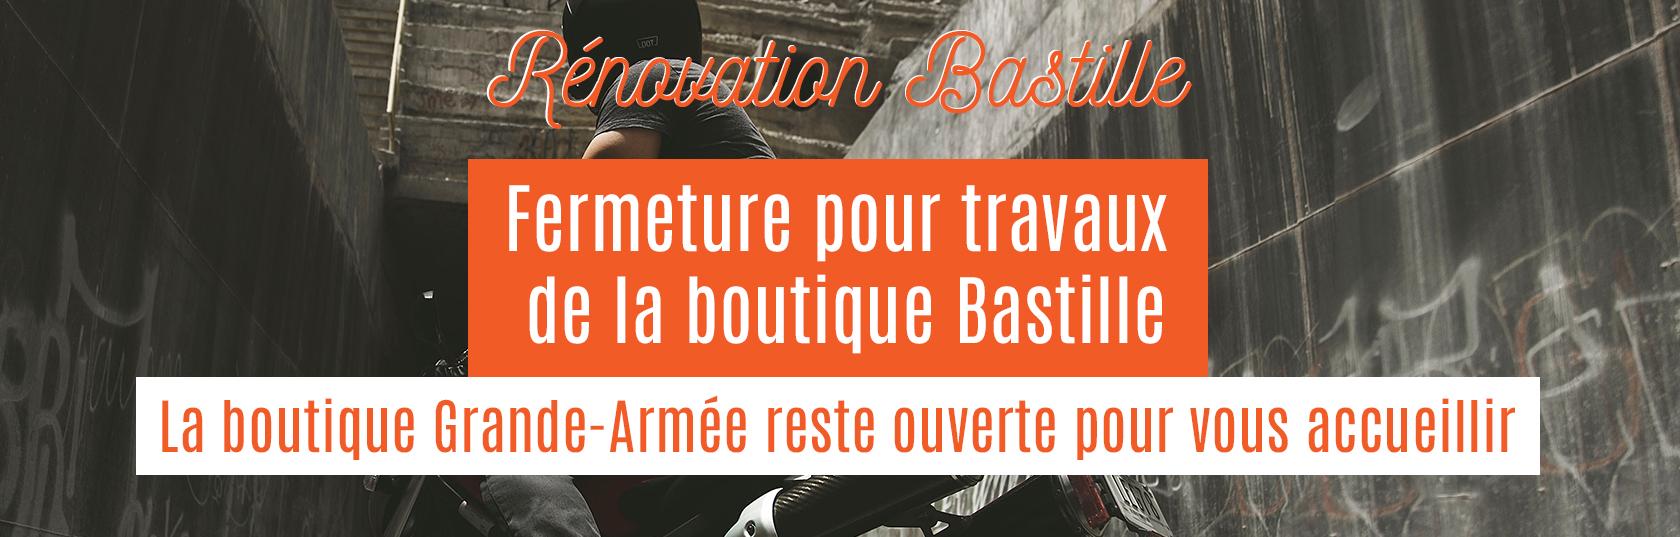 Renovation Bastille